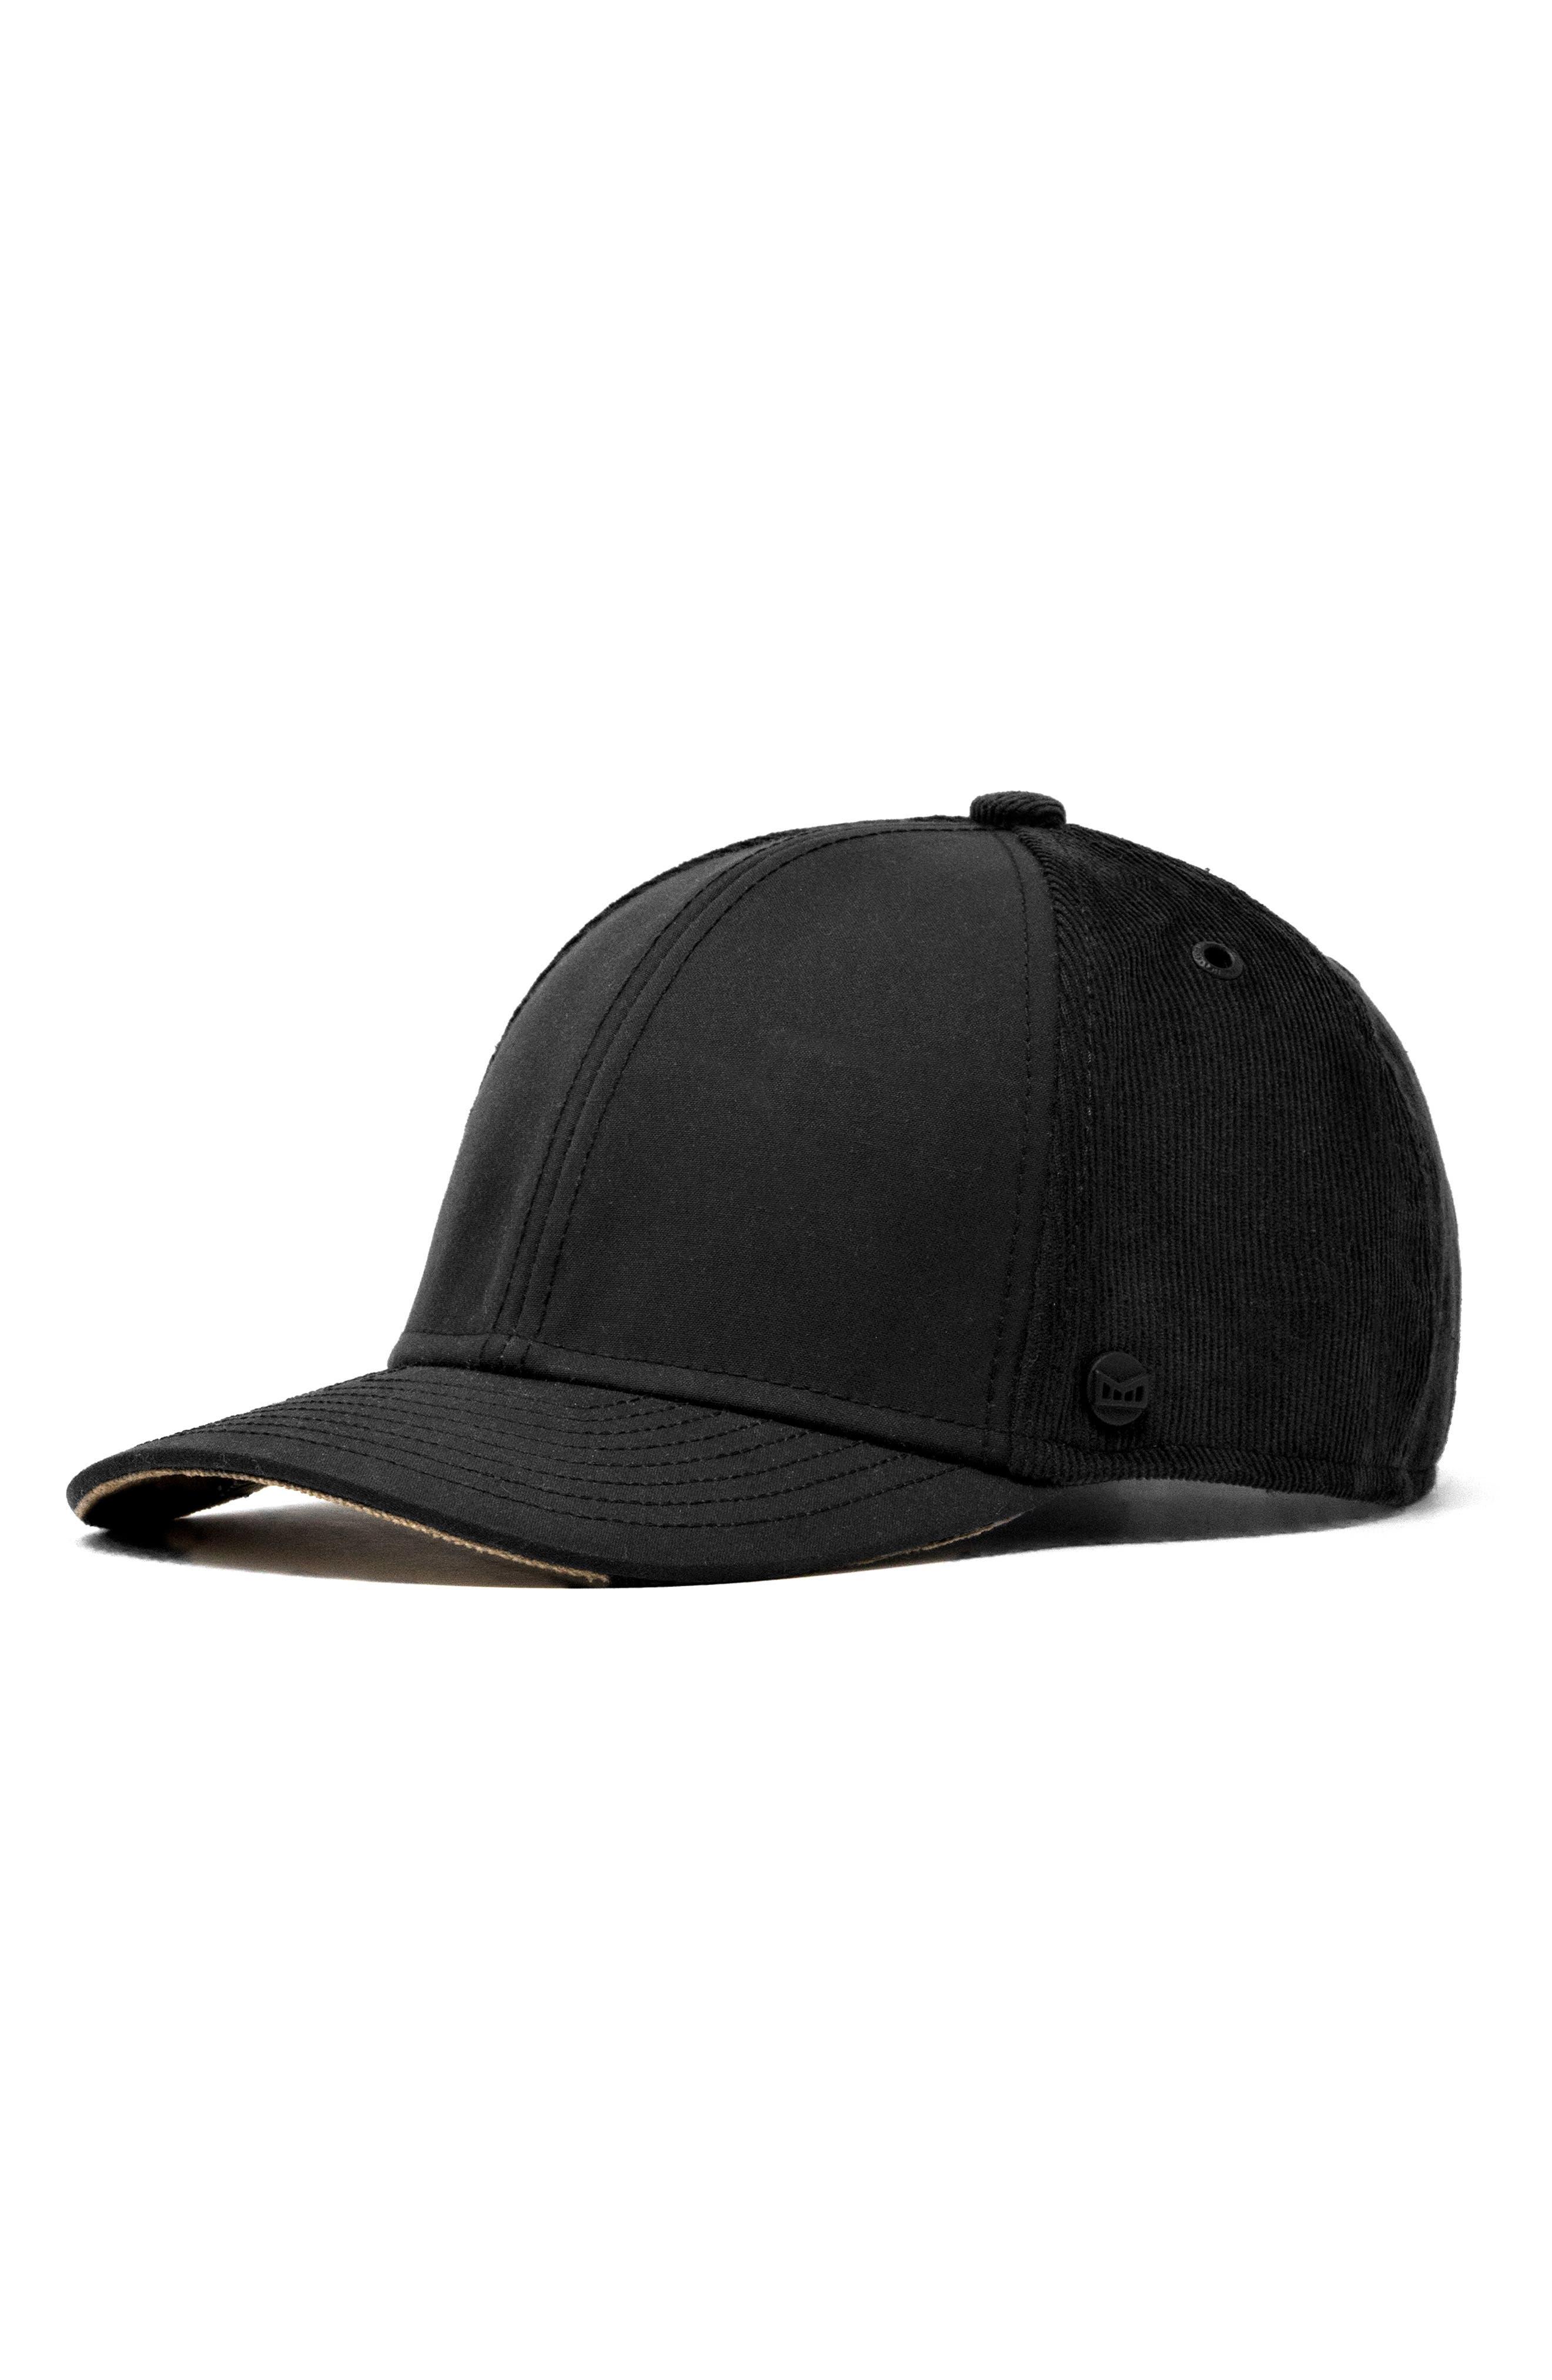 MELIN Discovery Baseball Cap - Black